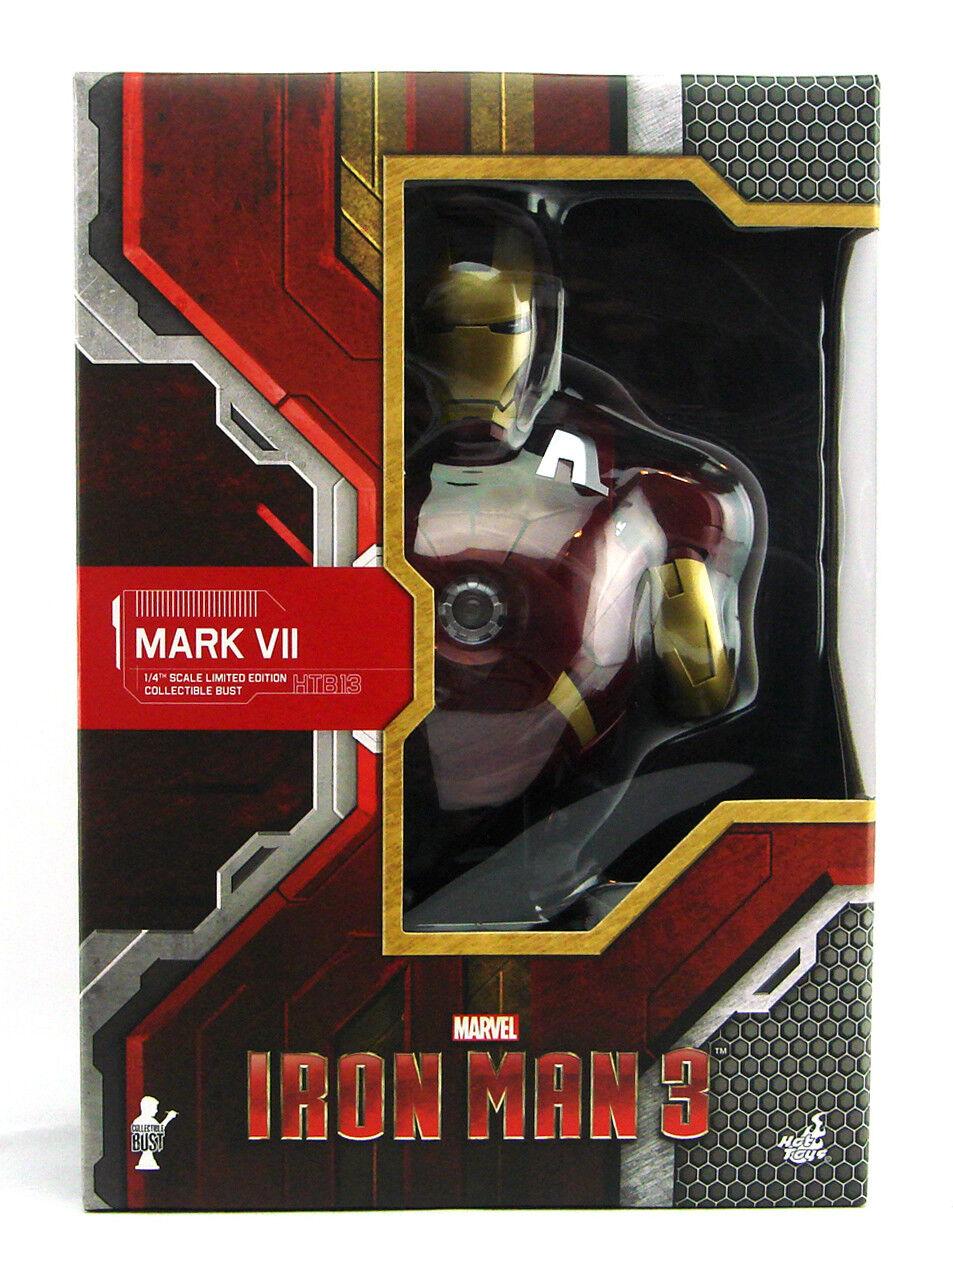 Hot Toys Iron Man Mark VII Armor 1/4 Scale Bust Iron Man 3 Marvel Avengers New